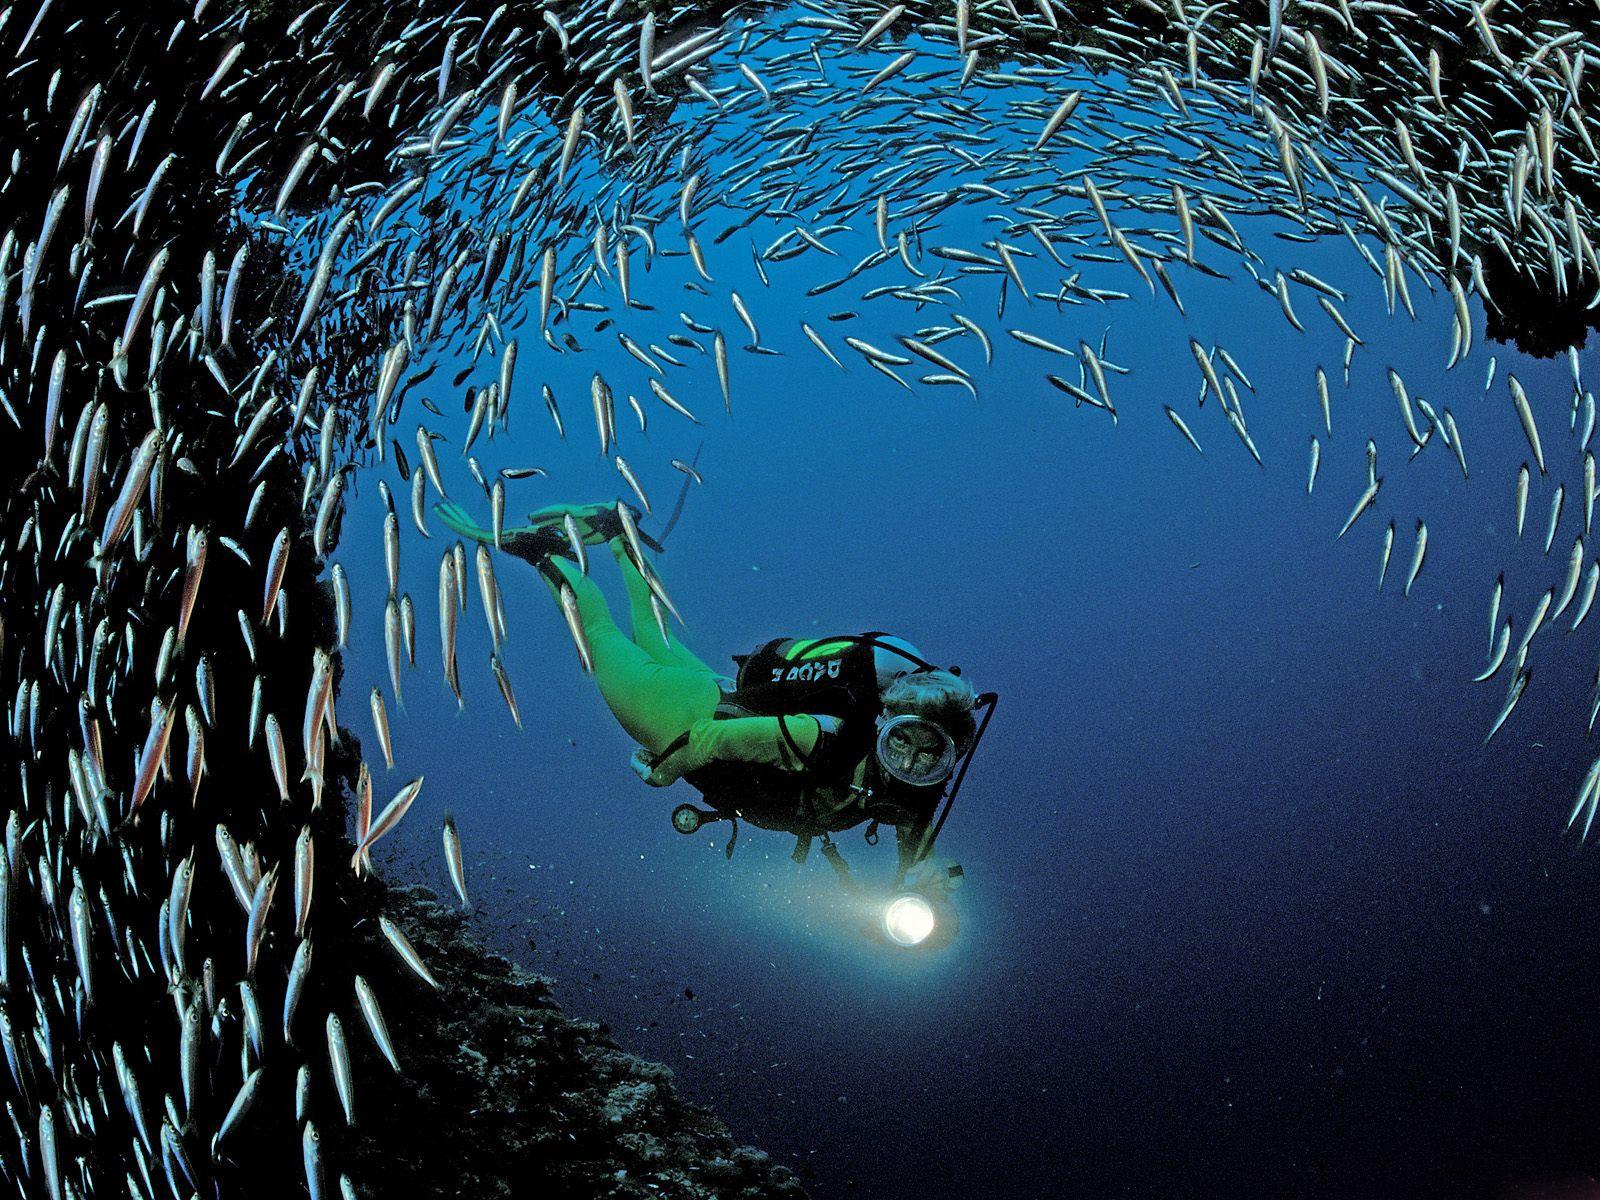 https://3.bp.blogspot.com/_rAsiSS06Zgg/TPfFfbIrp_I/AAAAAAAABOE/8PusVTdIqCY/s1600/Underwater%2BWallpaper%2B%2525285%252529.jpg